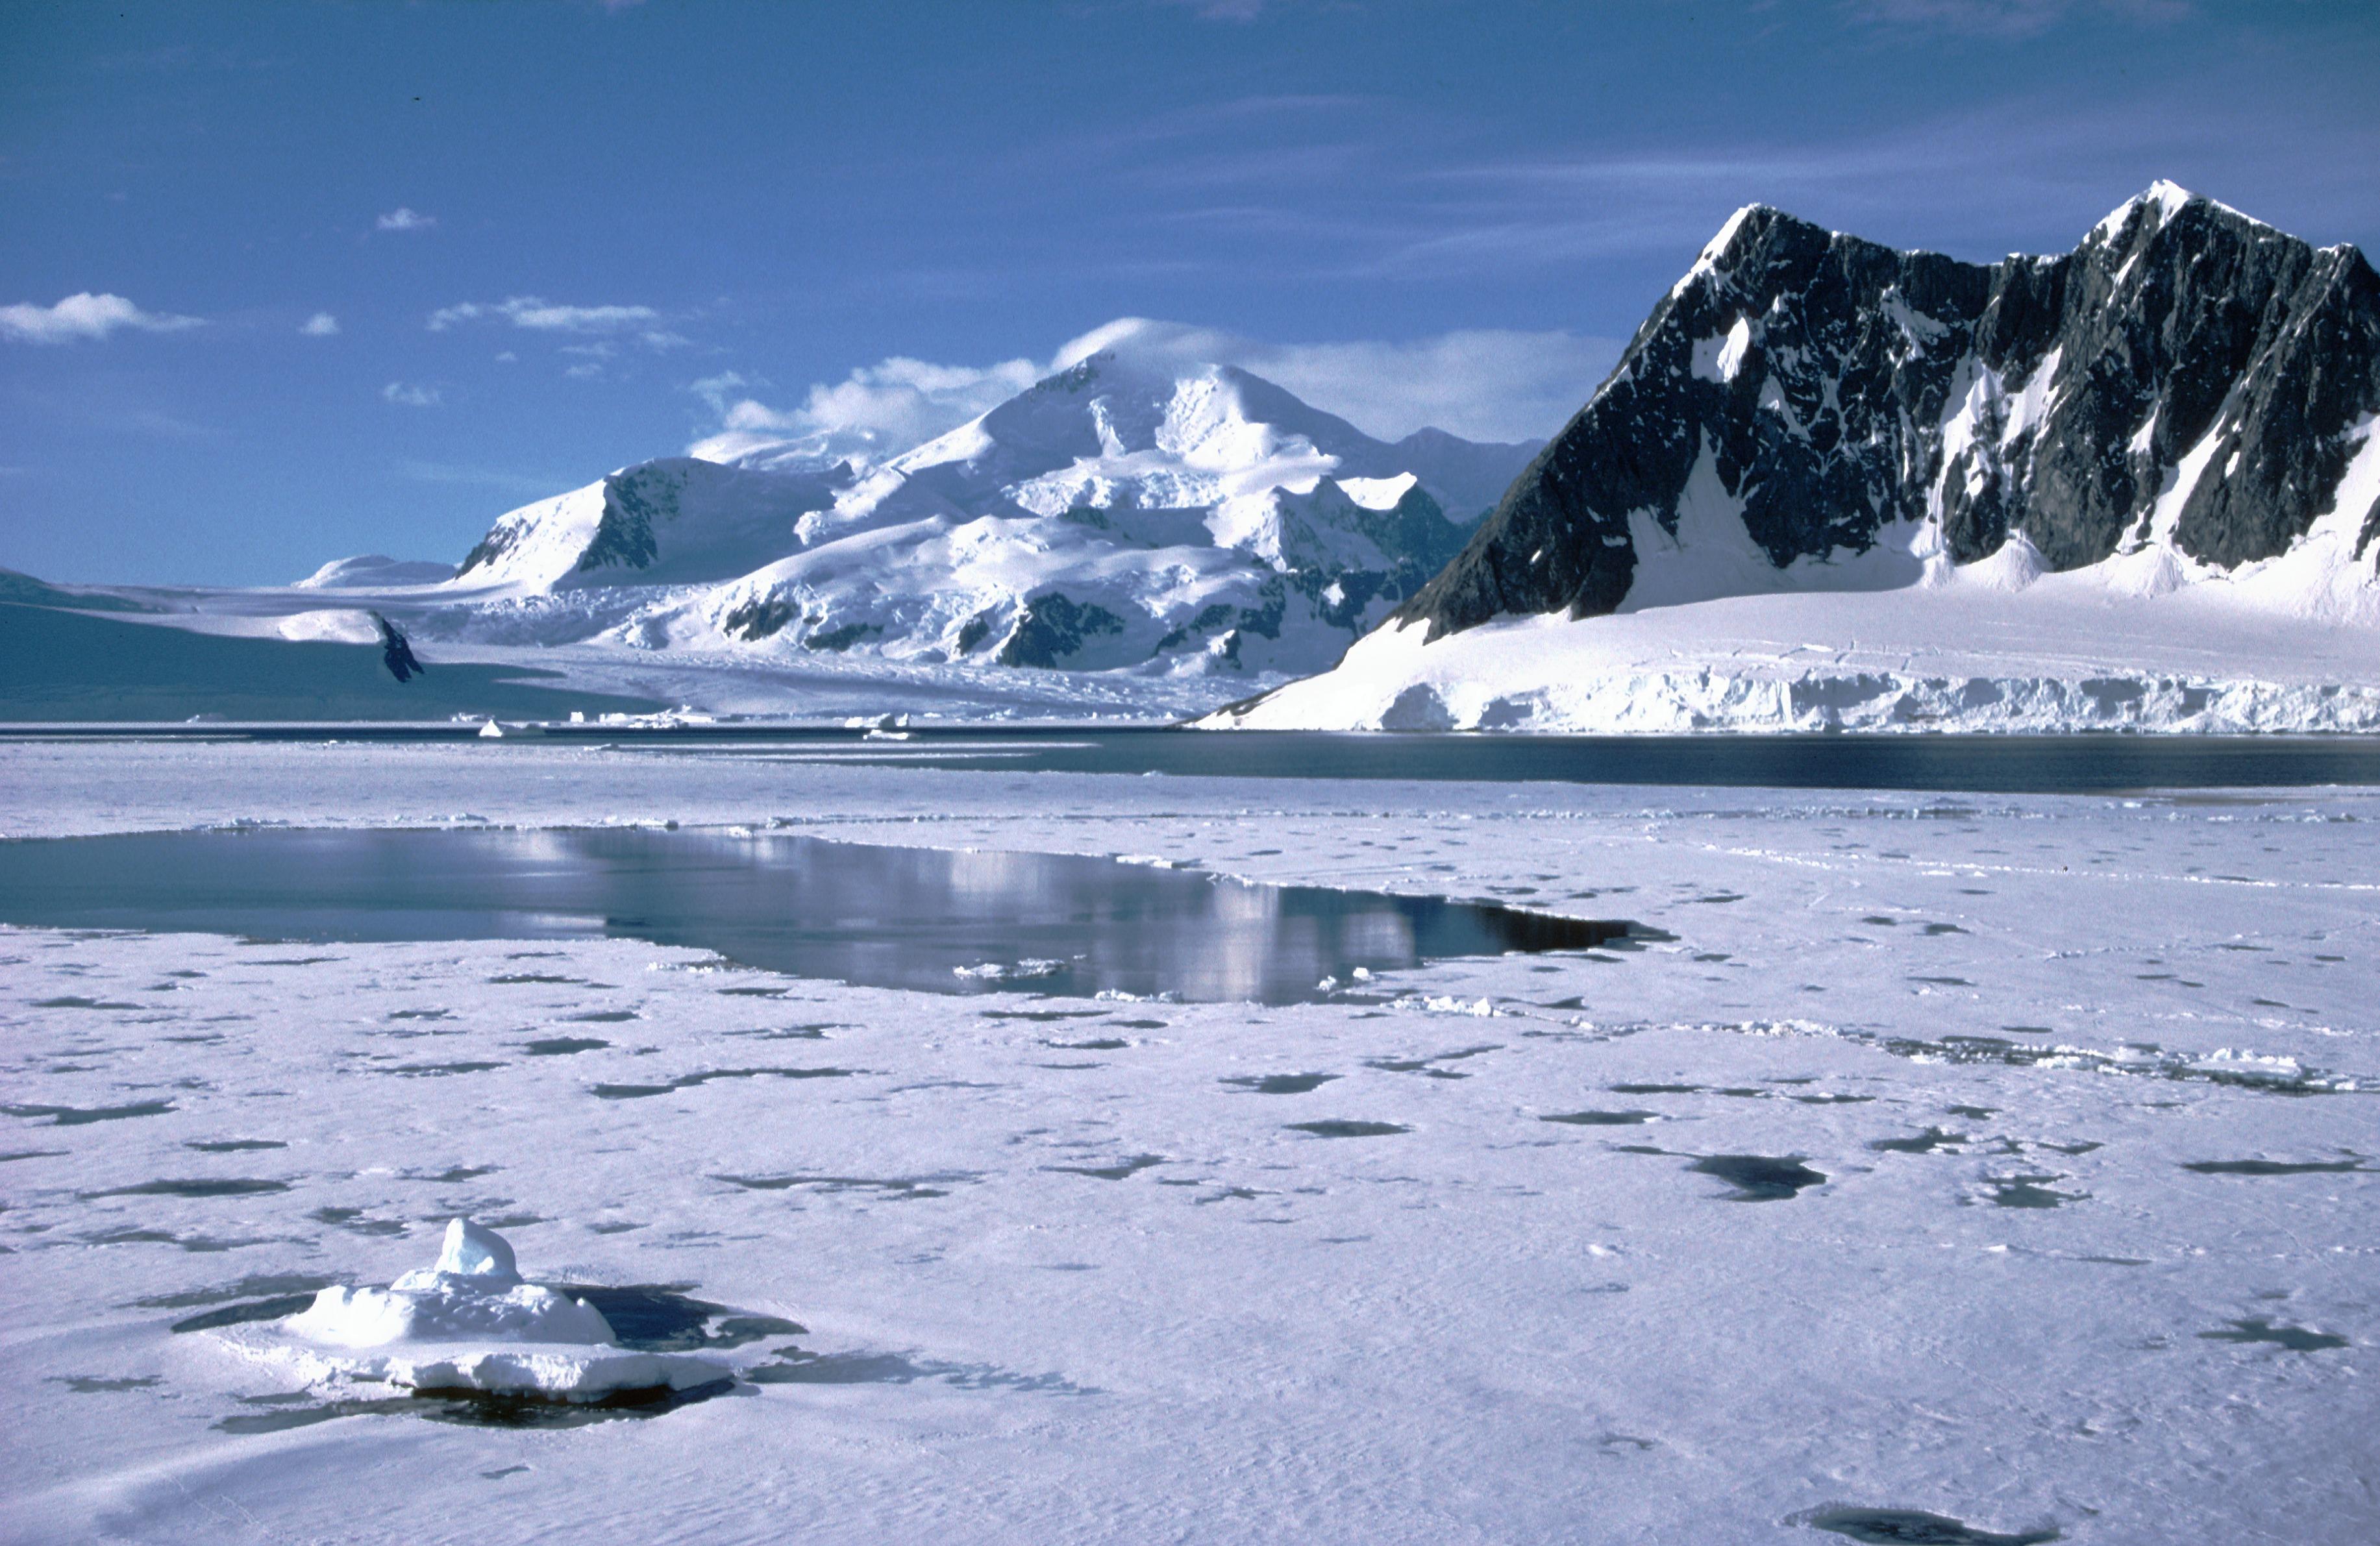 ... sea ice cov... Effects Of Global Warming Nasa